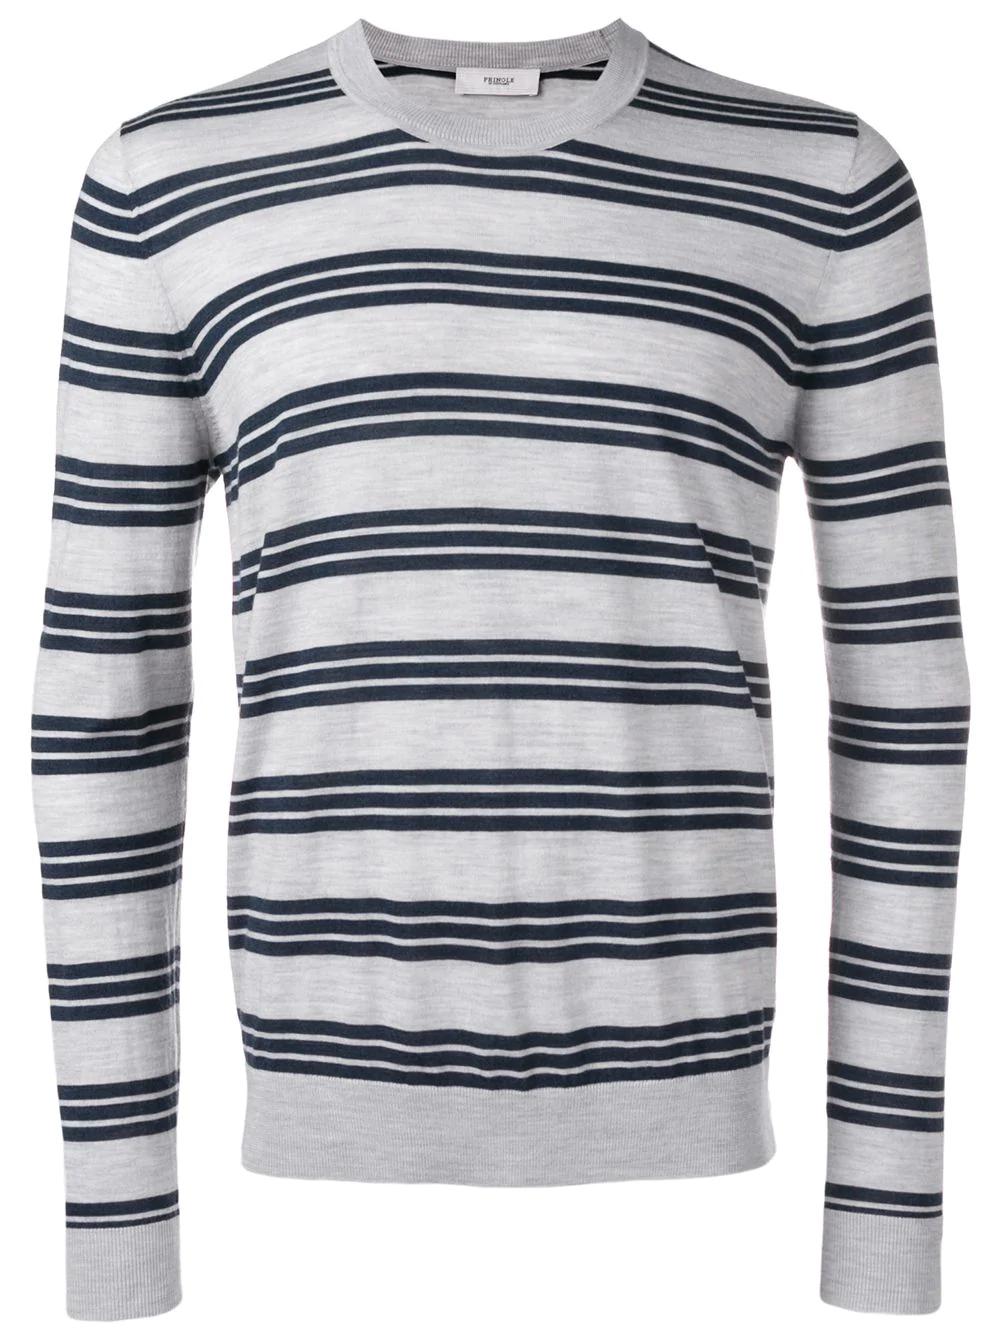 56cb3aef Pringle Of Scotland Striped Merino Wool Jumper - Grey | ModeSens